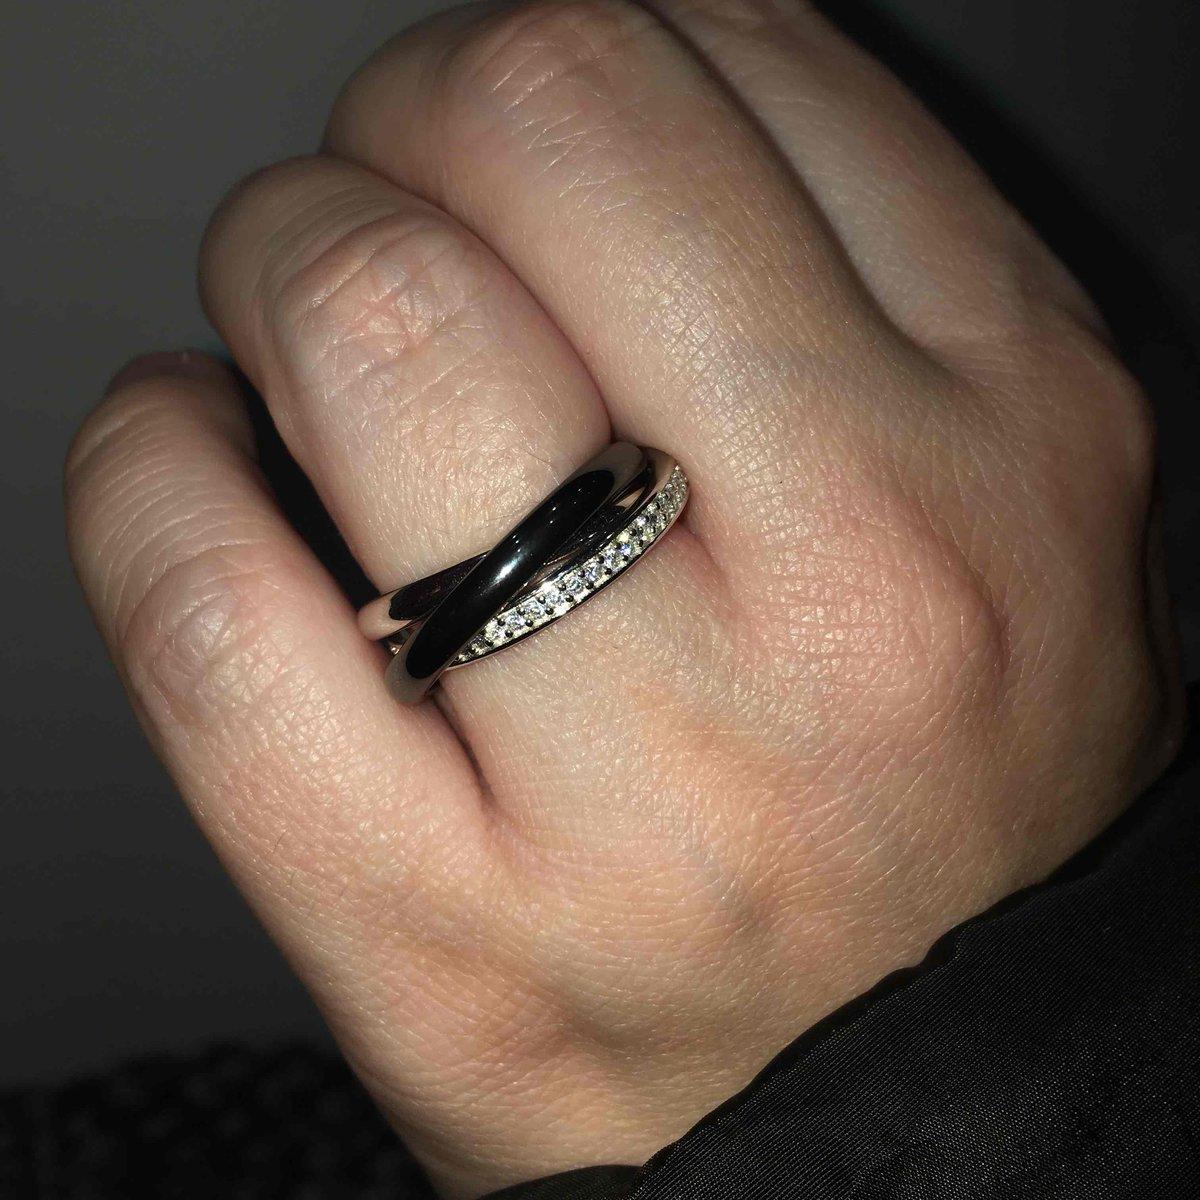 Красивое кольцо по красивой цене!